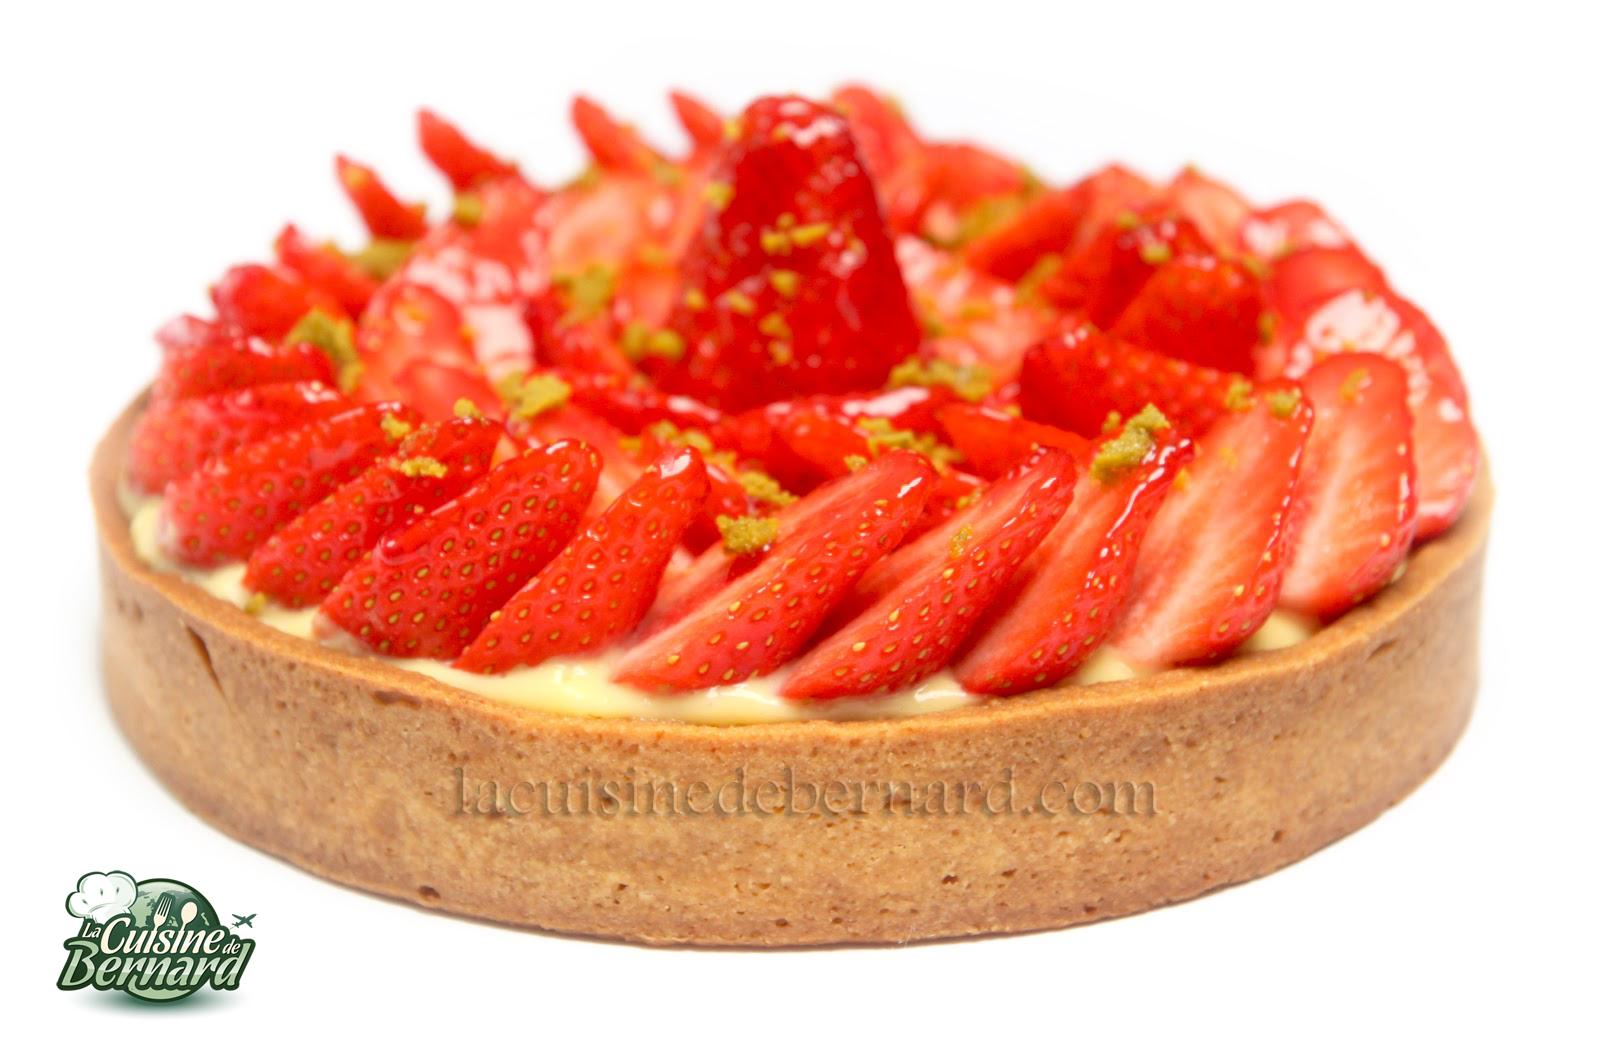 Tarte aux fraises grand chef